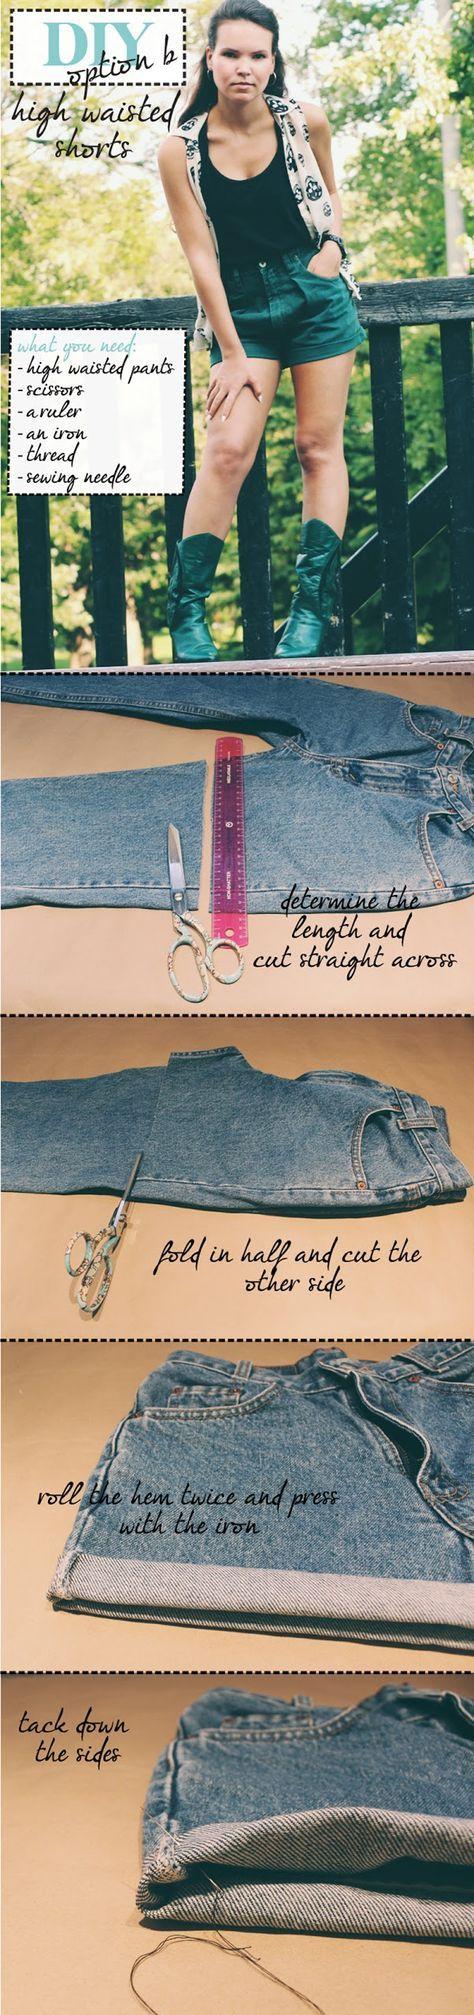 Sarrah Dolly: DIY :: High Waisted Shorts Option B #highwaisted #shorts #DIY-#DIY #Dolly #High #highwaisted #Option #Sarrah #shorts #Waisted